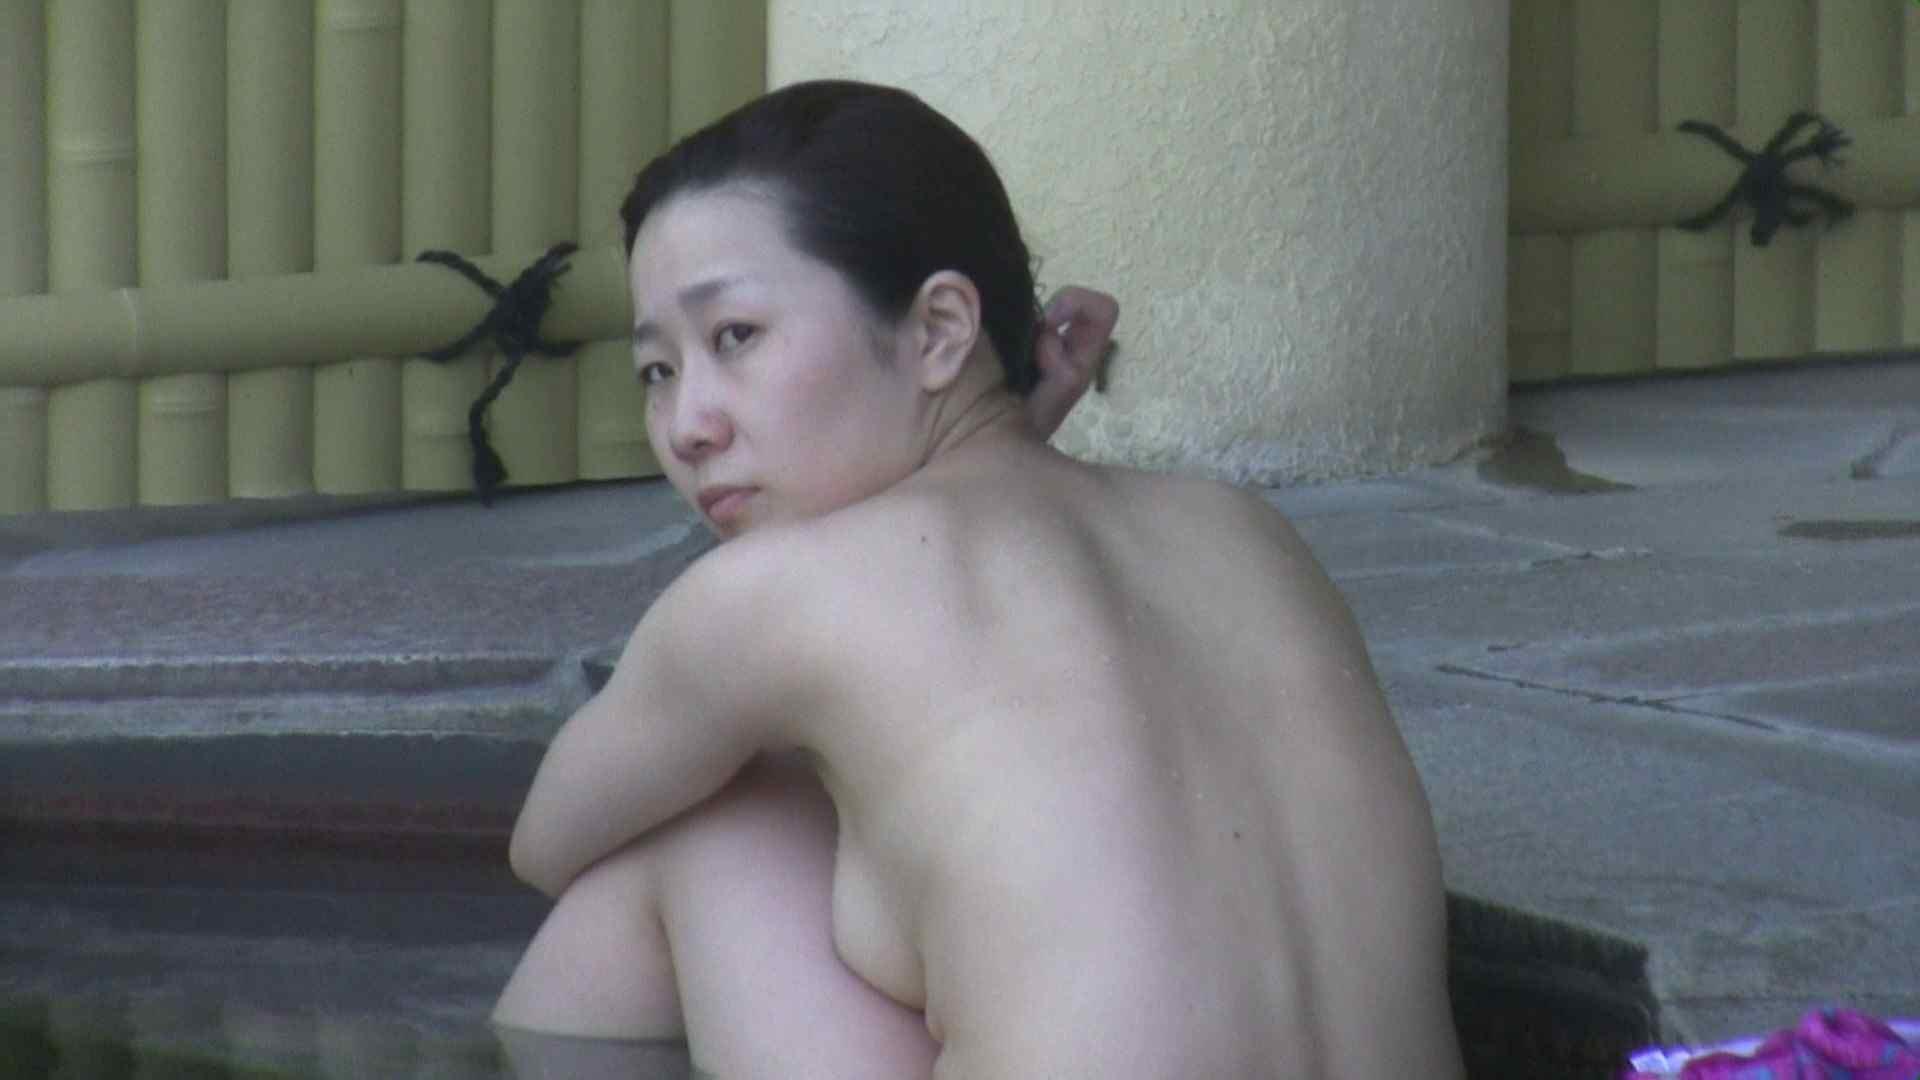 Aquaな露天風呂Vol.88【VIP限定】 綺麗なOLたち | 盗撮  57枚 13